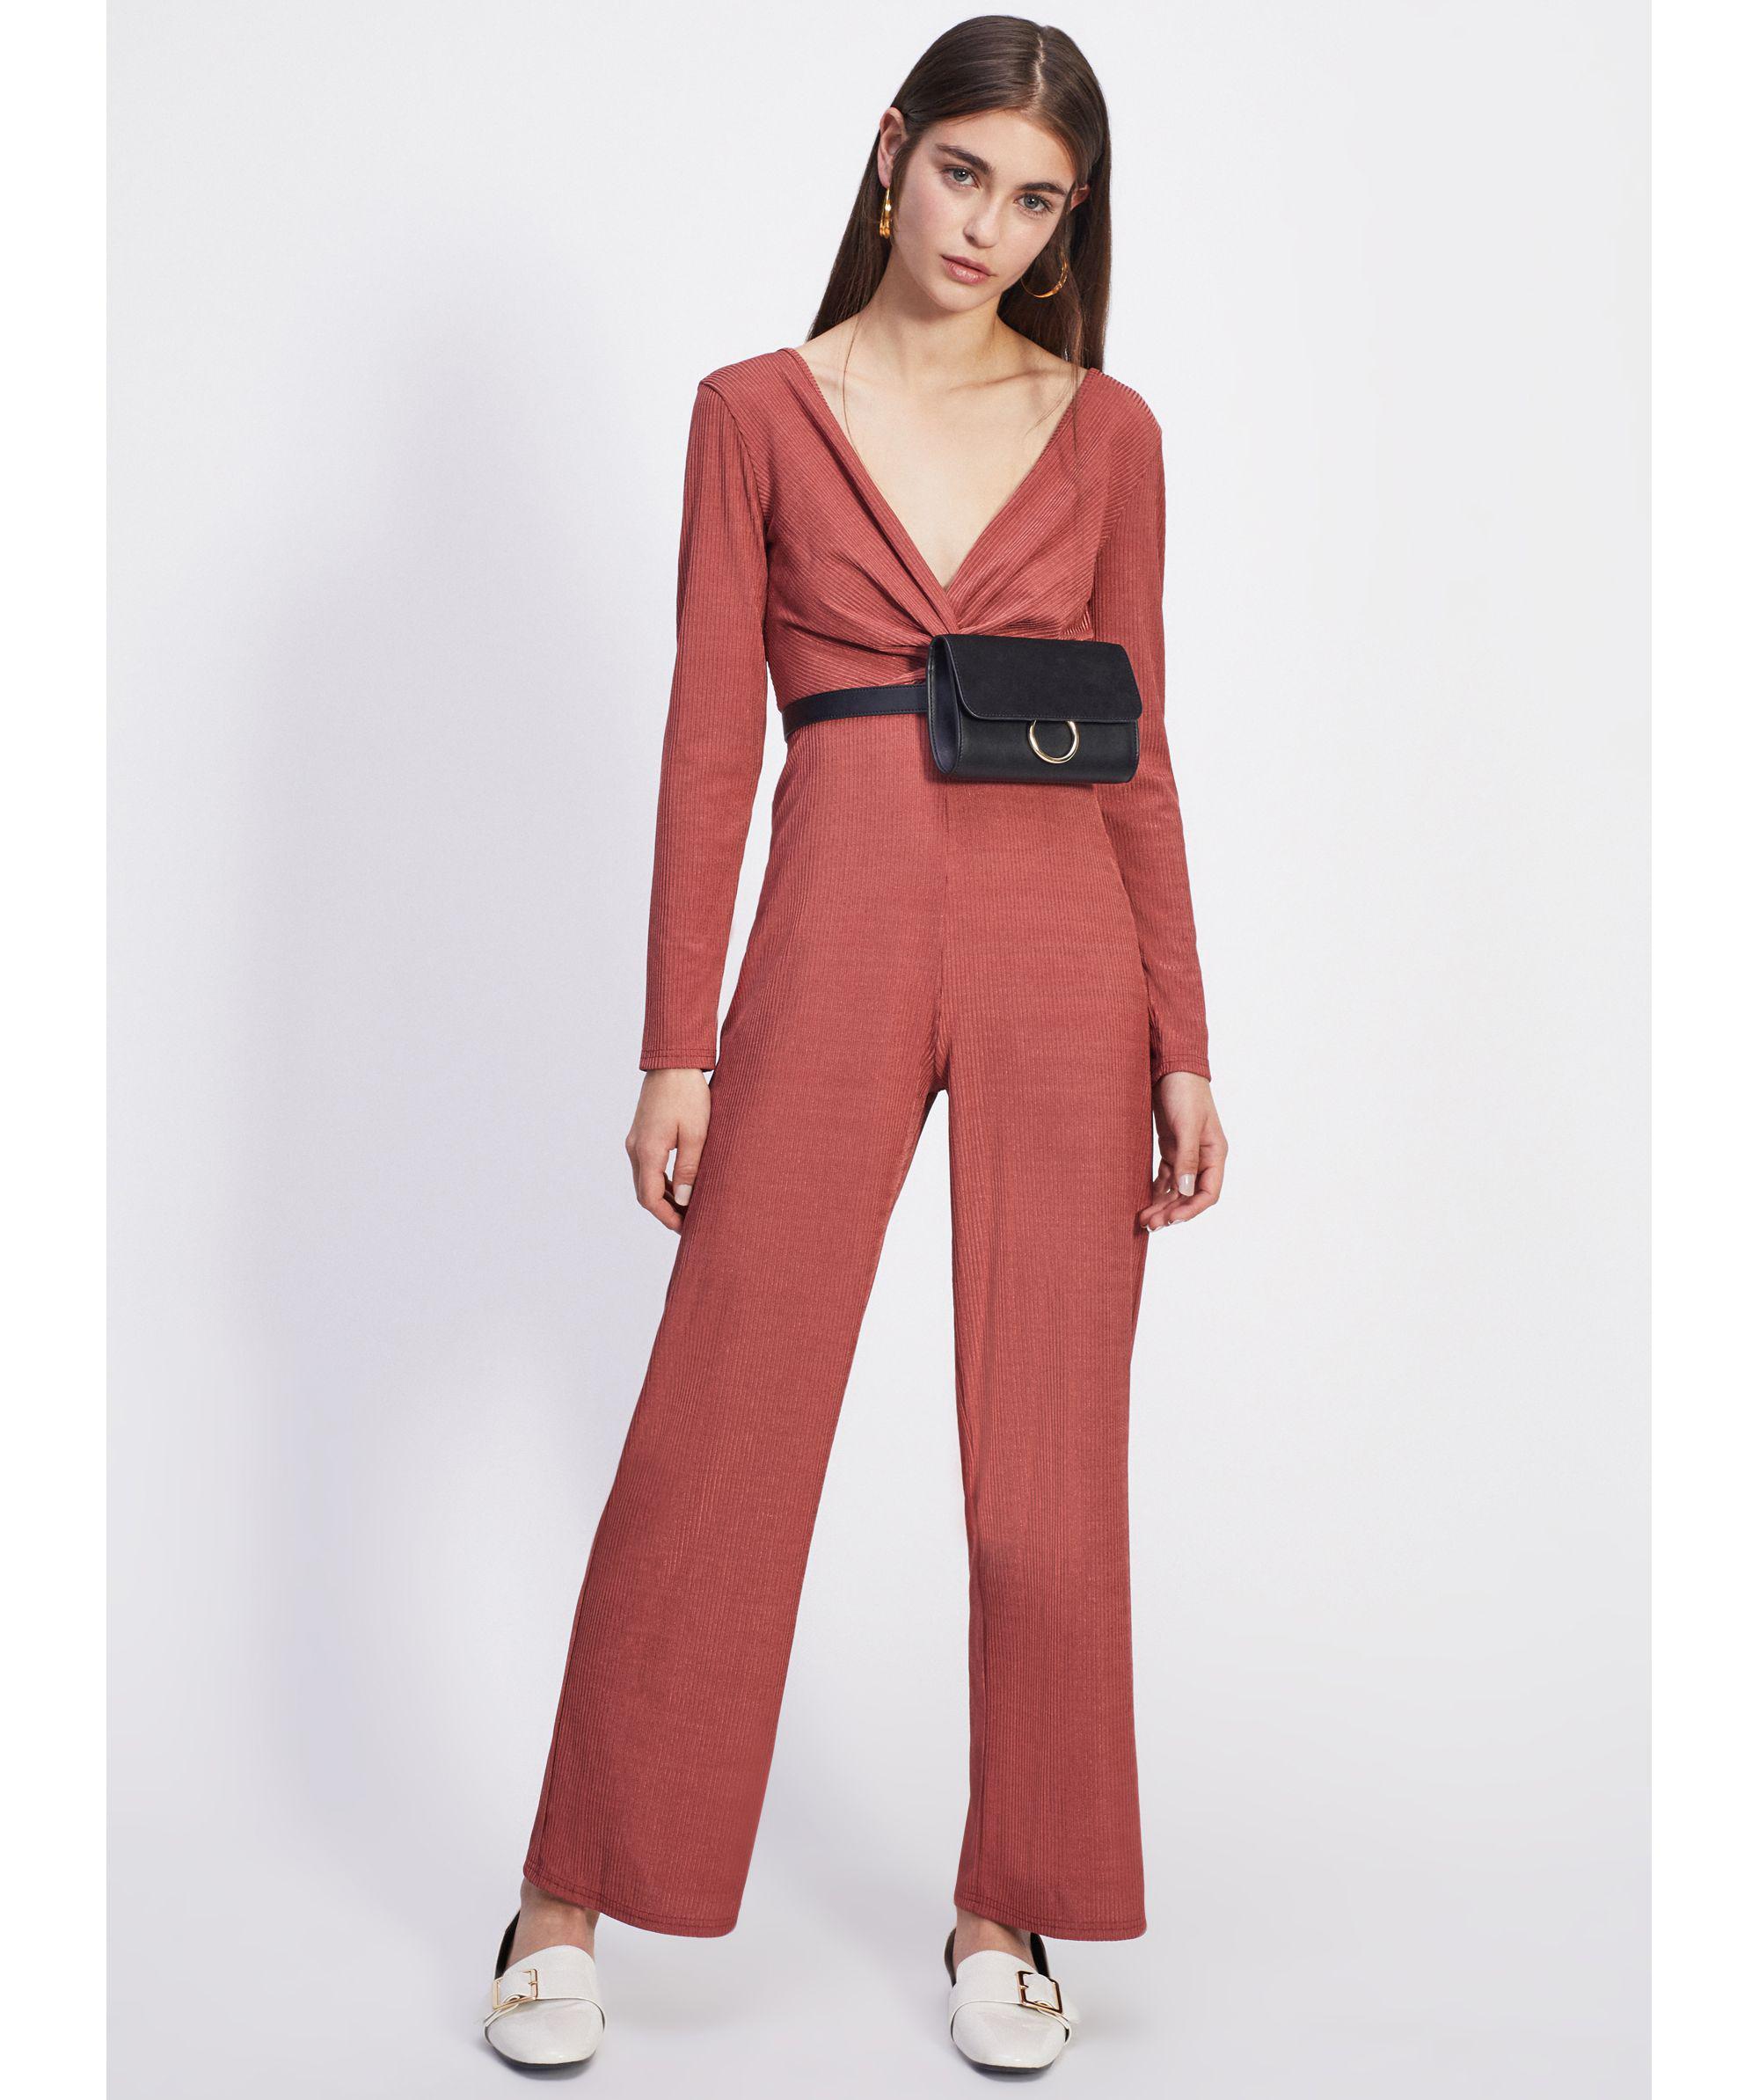 56647130bc3 Miss Selfridge Petite Rust Twist Front Jumpsuit in Orange - Lyst